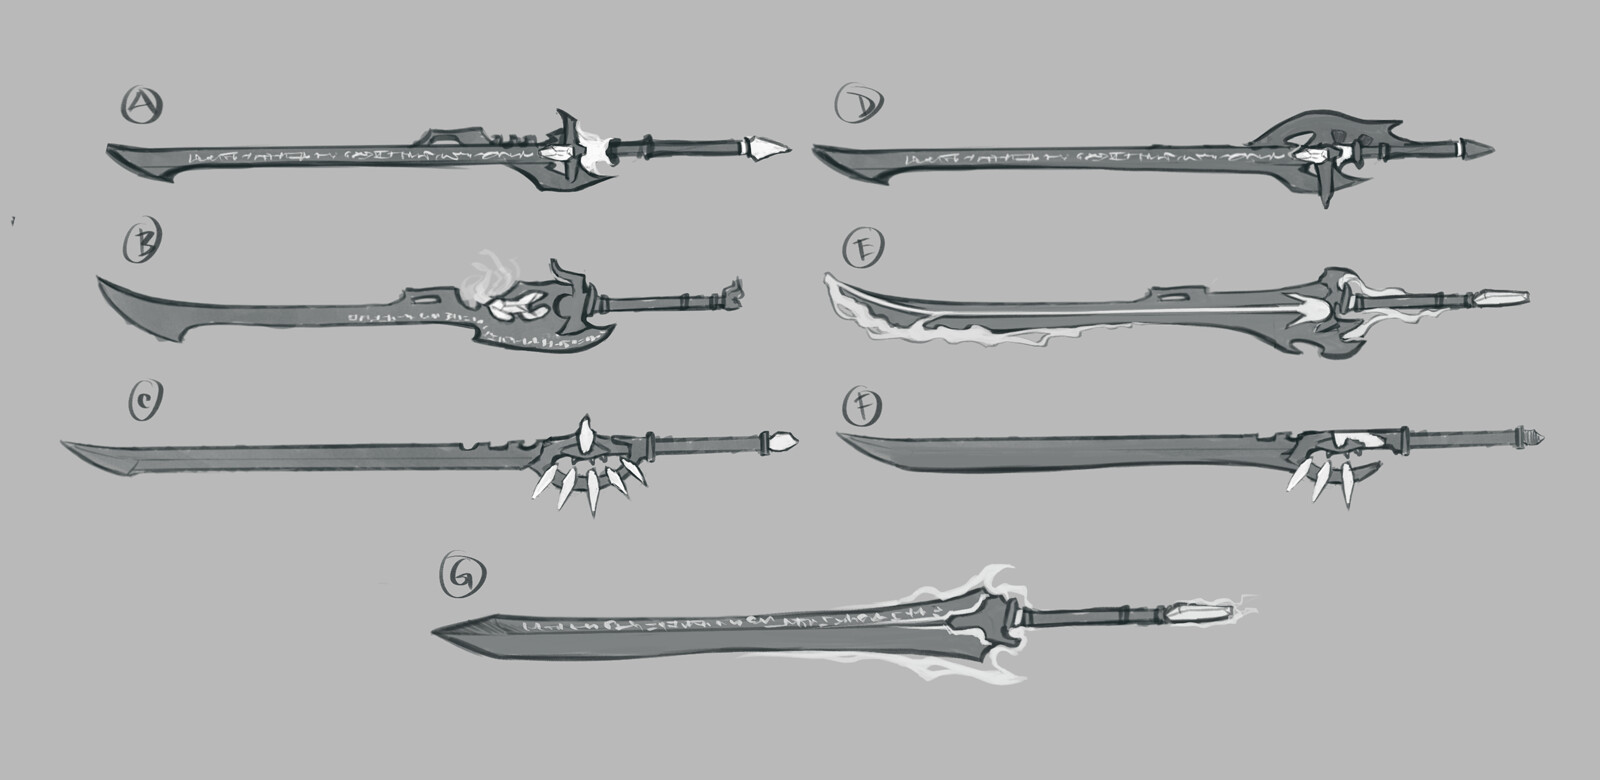 Filipe pinto zor sword sketches